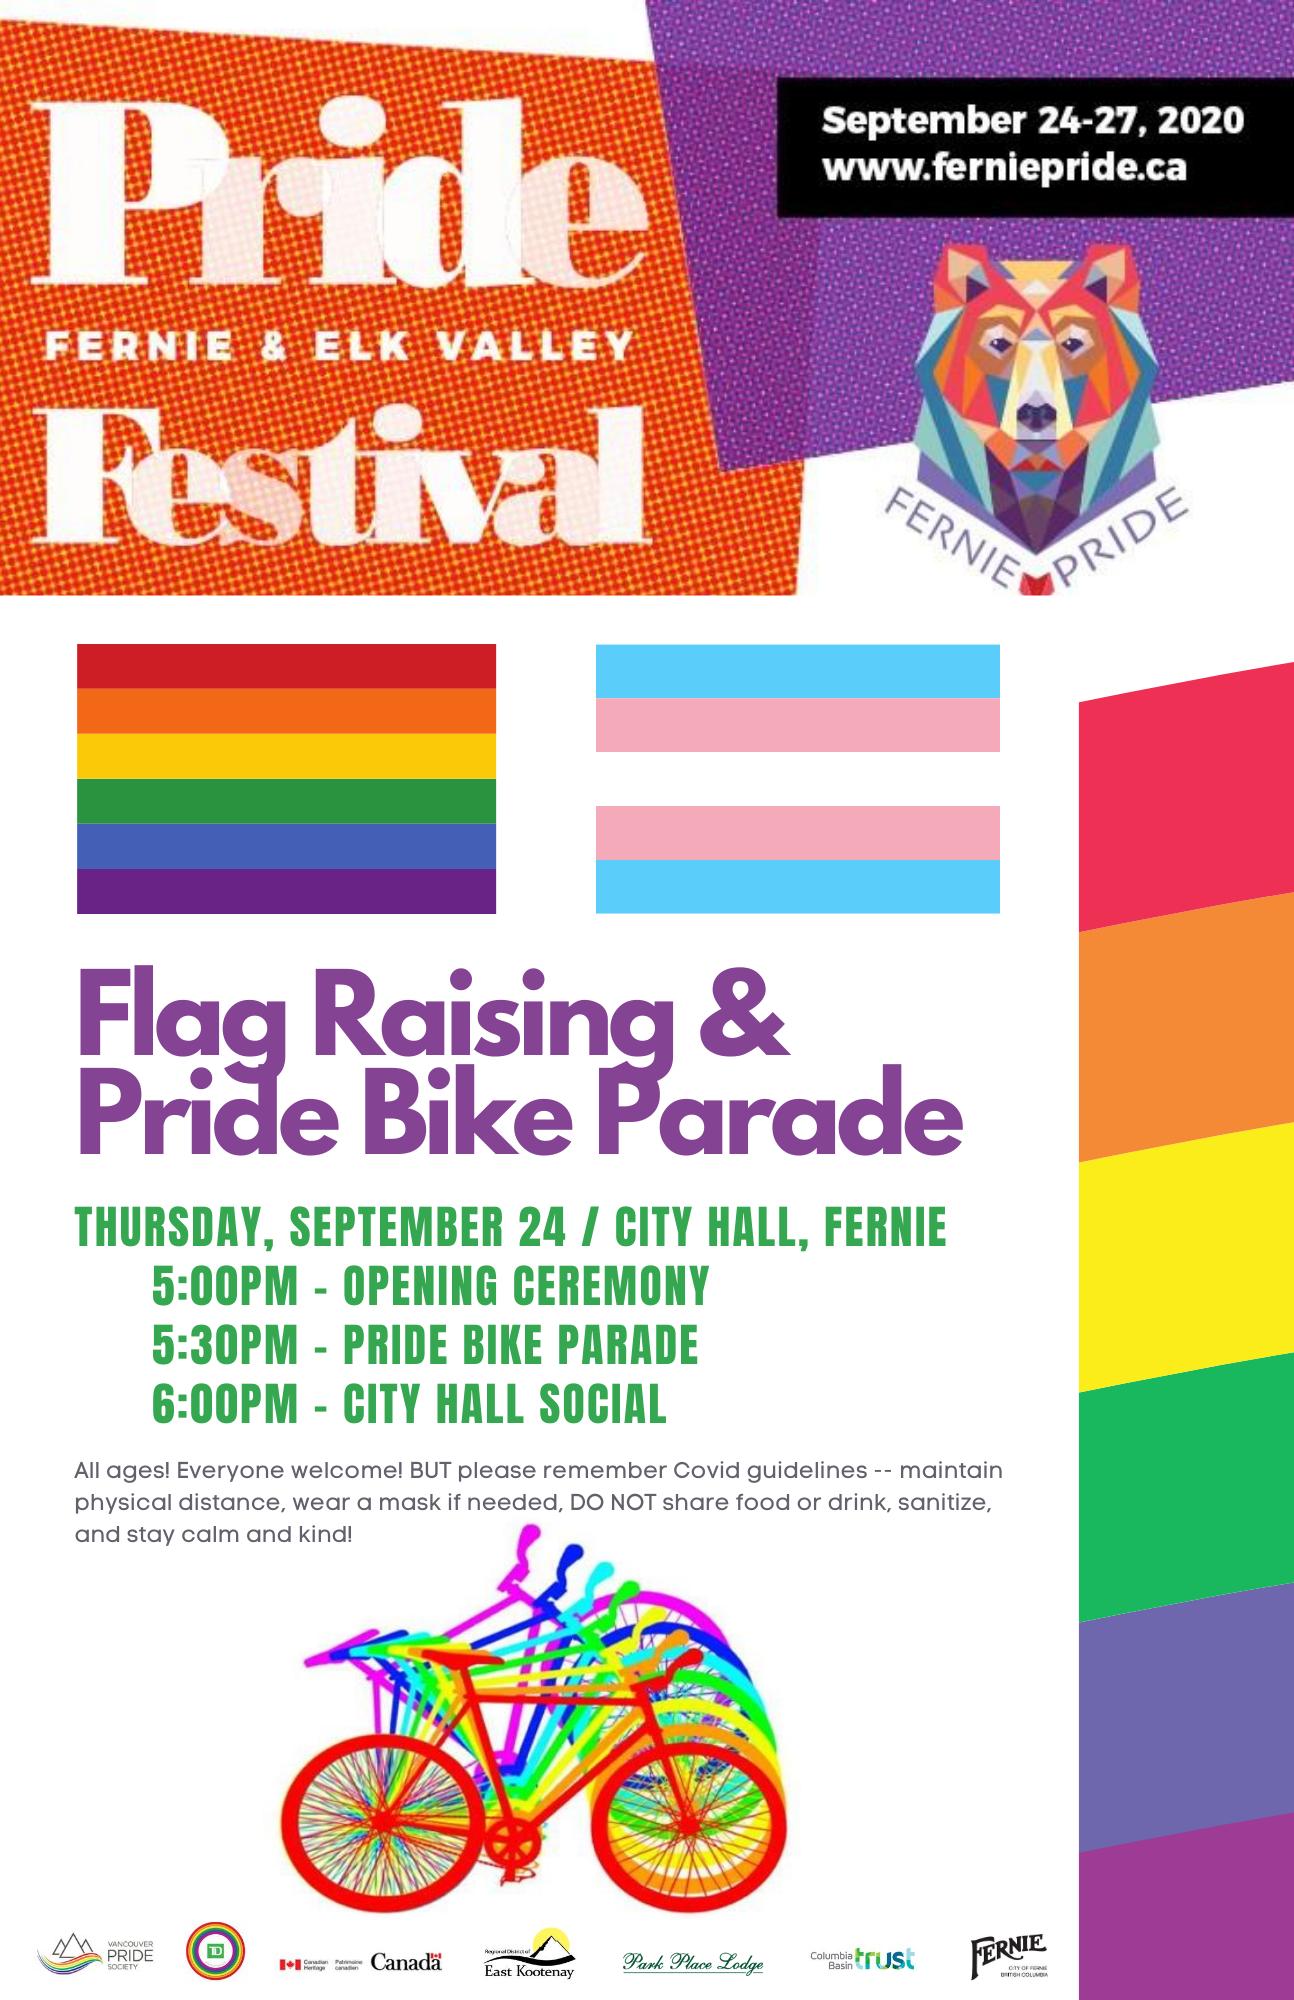 Rainbow True Brave Proud Posters